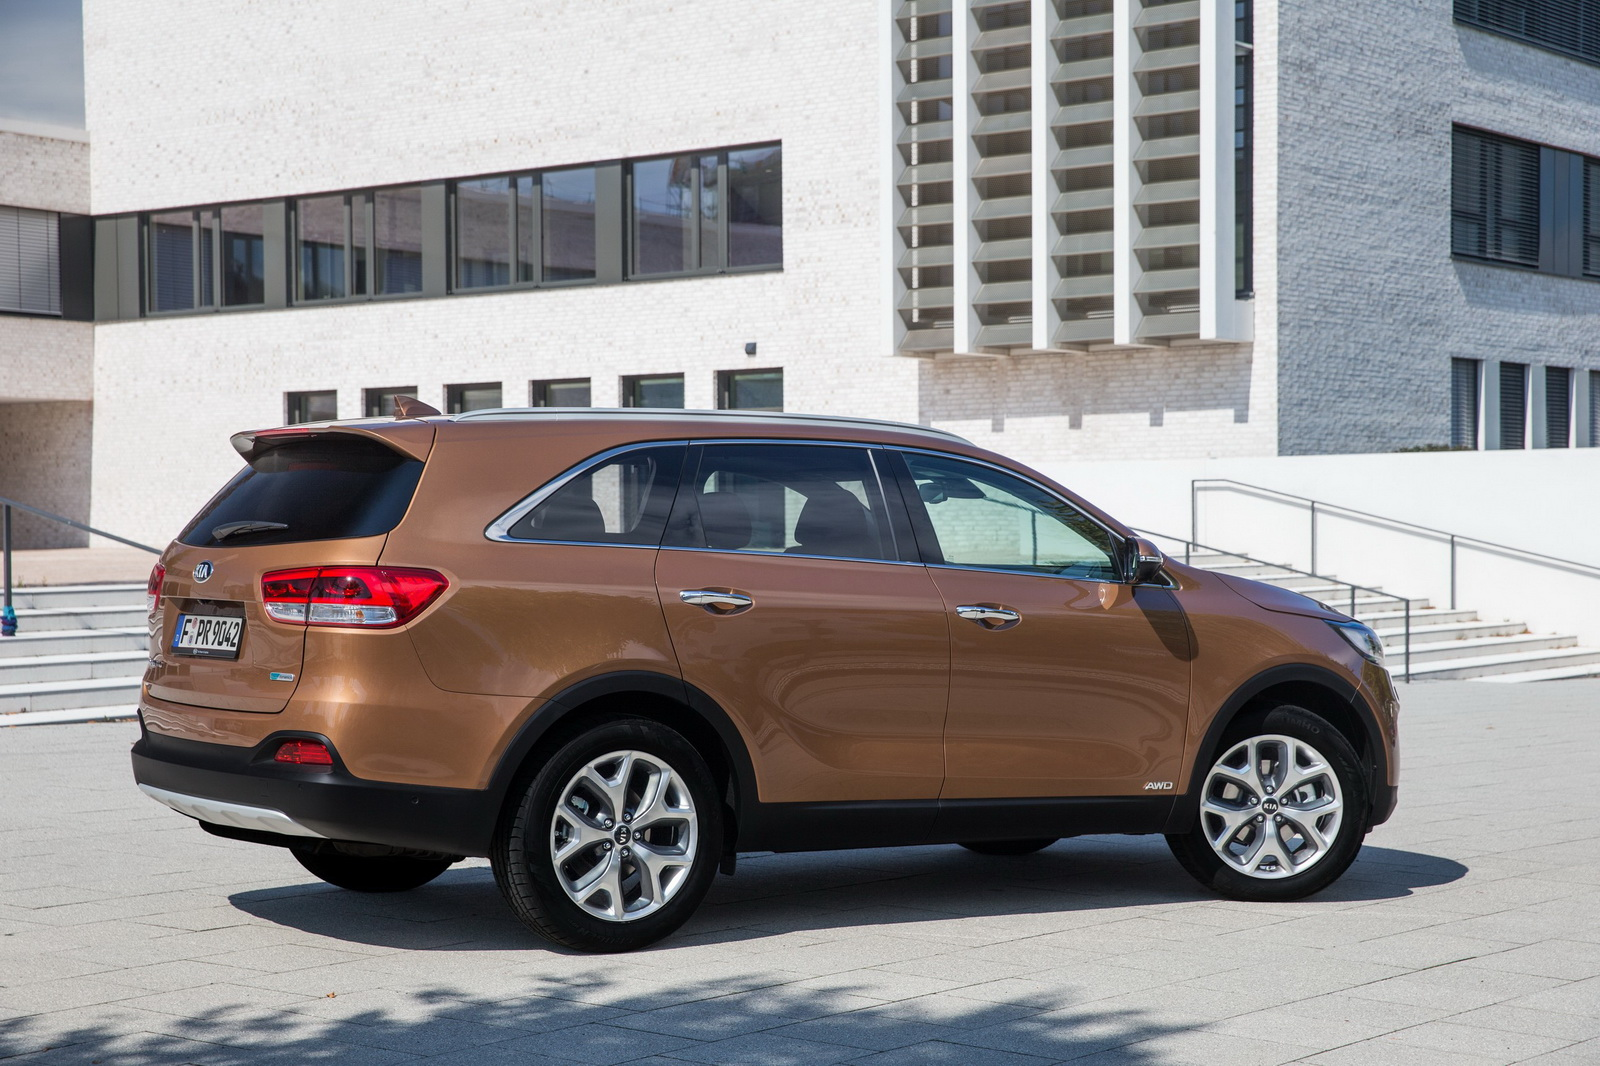 Kia Sorento: ikinci nesil SUV incelemeleri